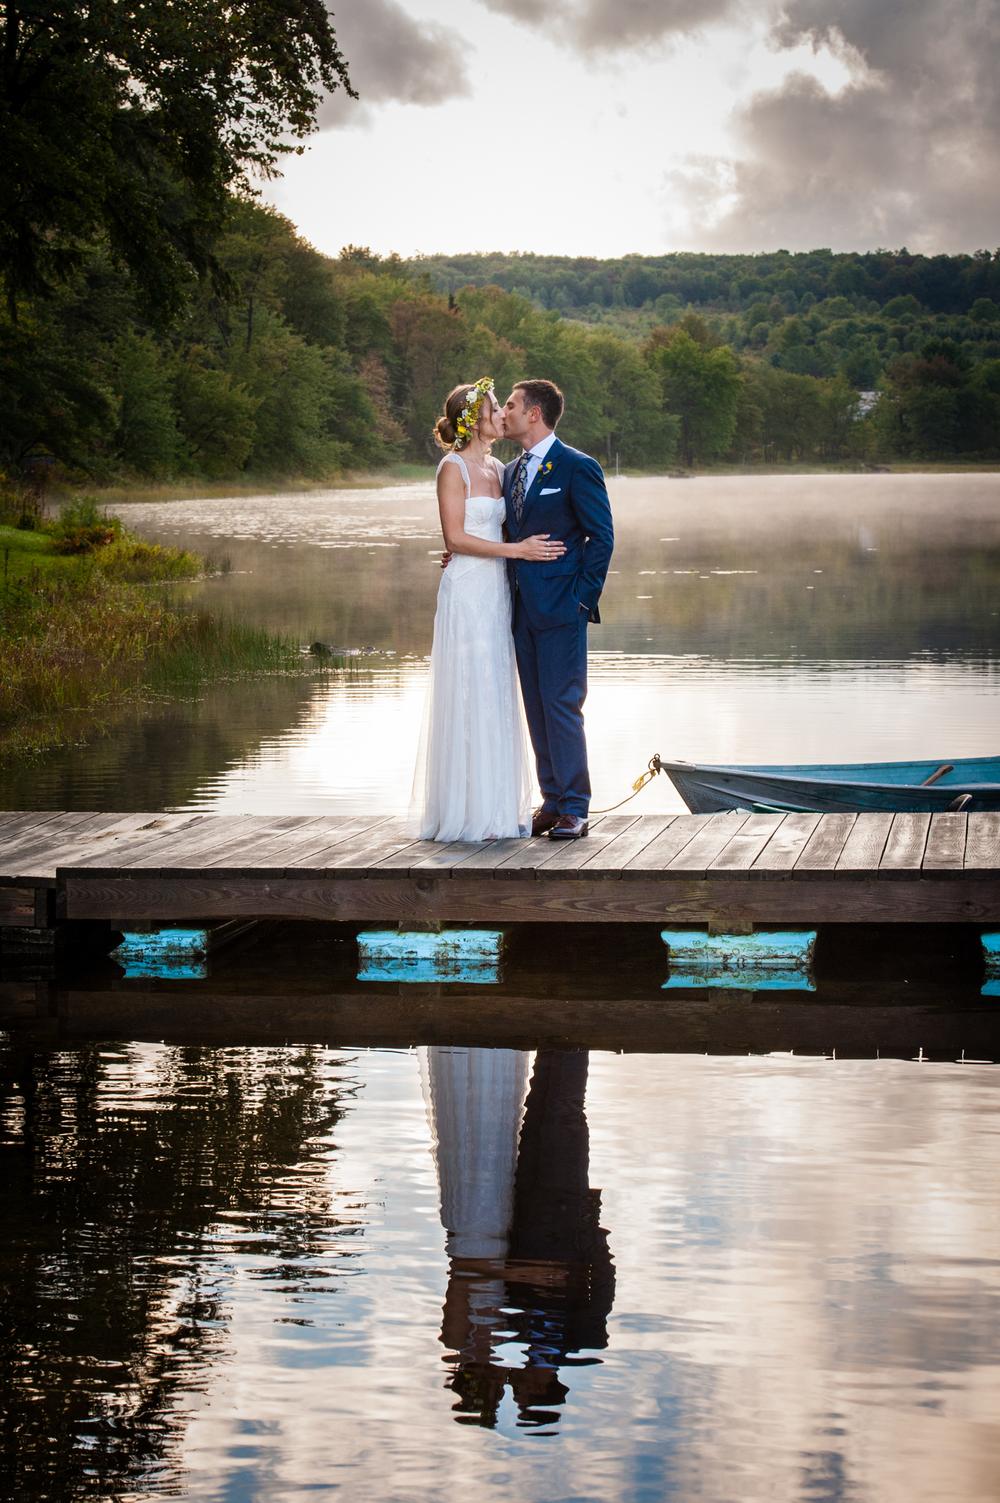 Rochester Wedding Photography 016.jpg